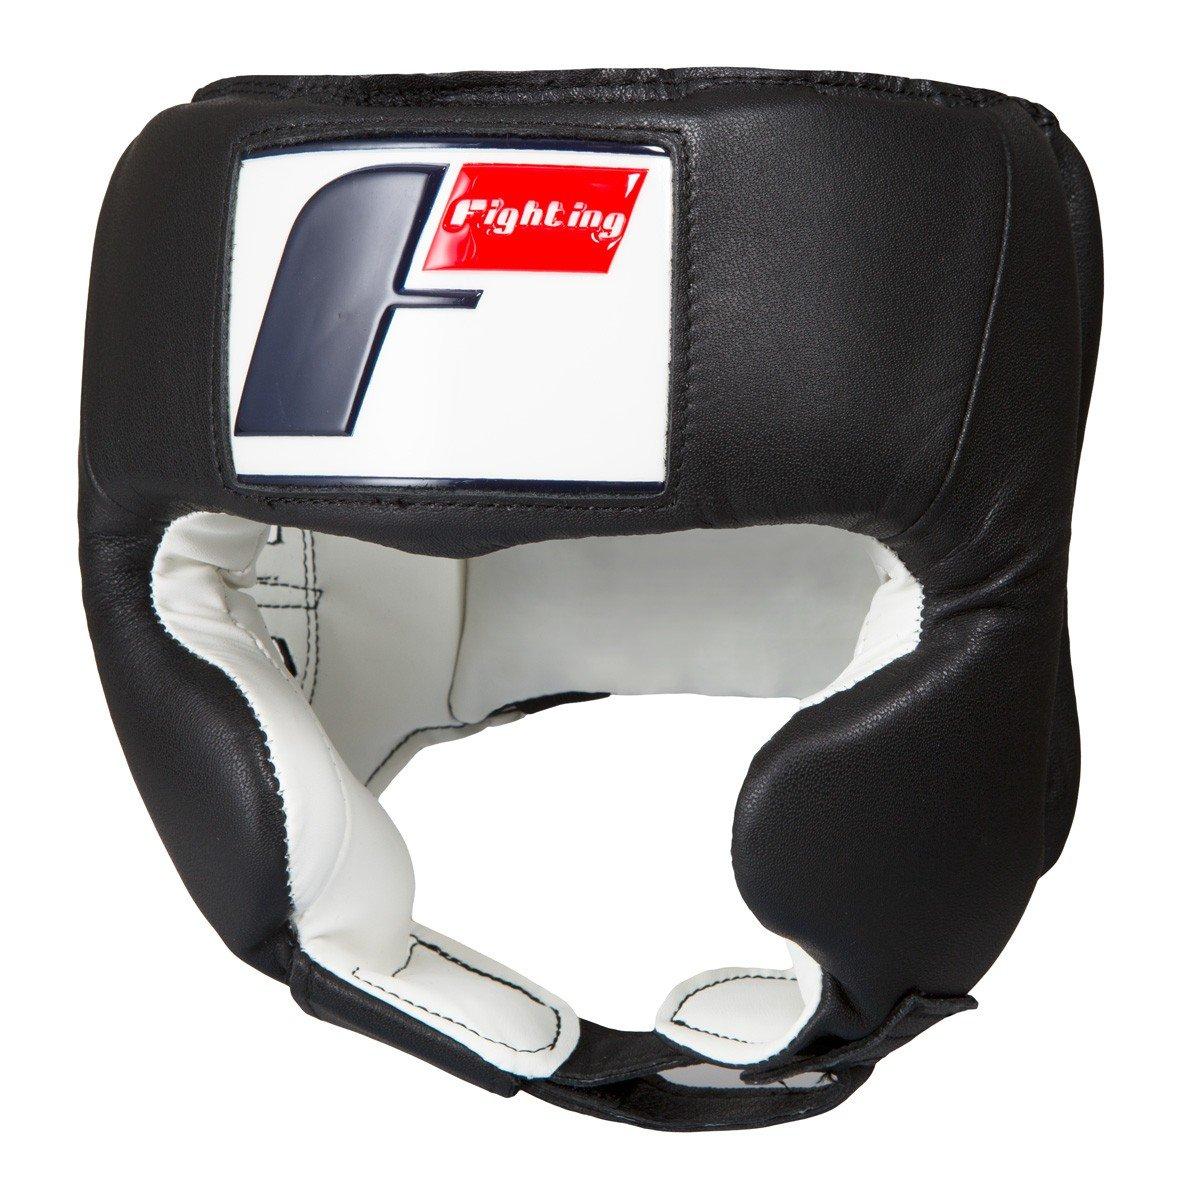 Fighting (チーク) Sports ブラック USA Boxing Competition Headgear (チーク) X-Large B003X53HPO ブラック B003X53HPO, アガソススタイル:45e33c0f --- capela.dominiotemporario.com